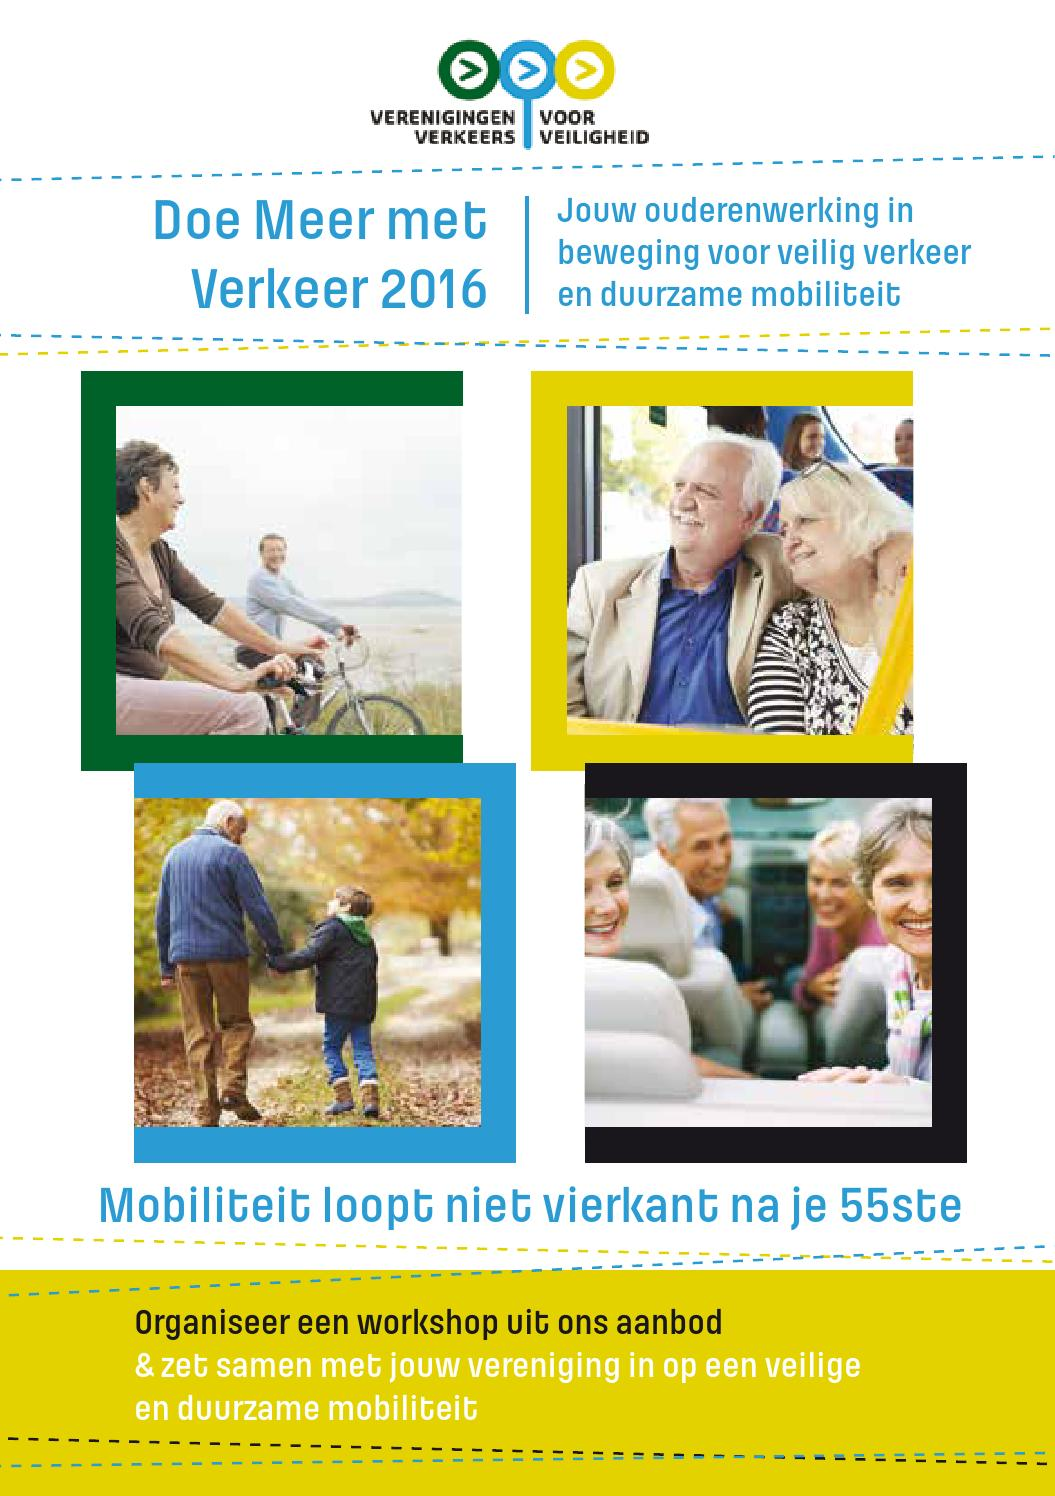 Doe meer met verkeer 2016 by netwerk duurzame mobiliteit issuu - Doe de toegangsgalerij opnieuw ...